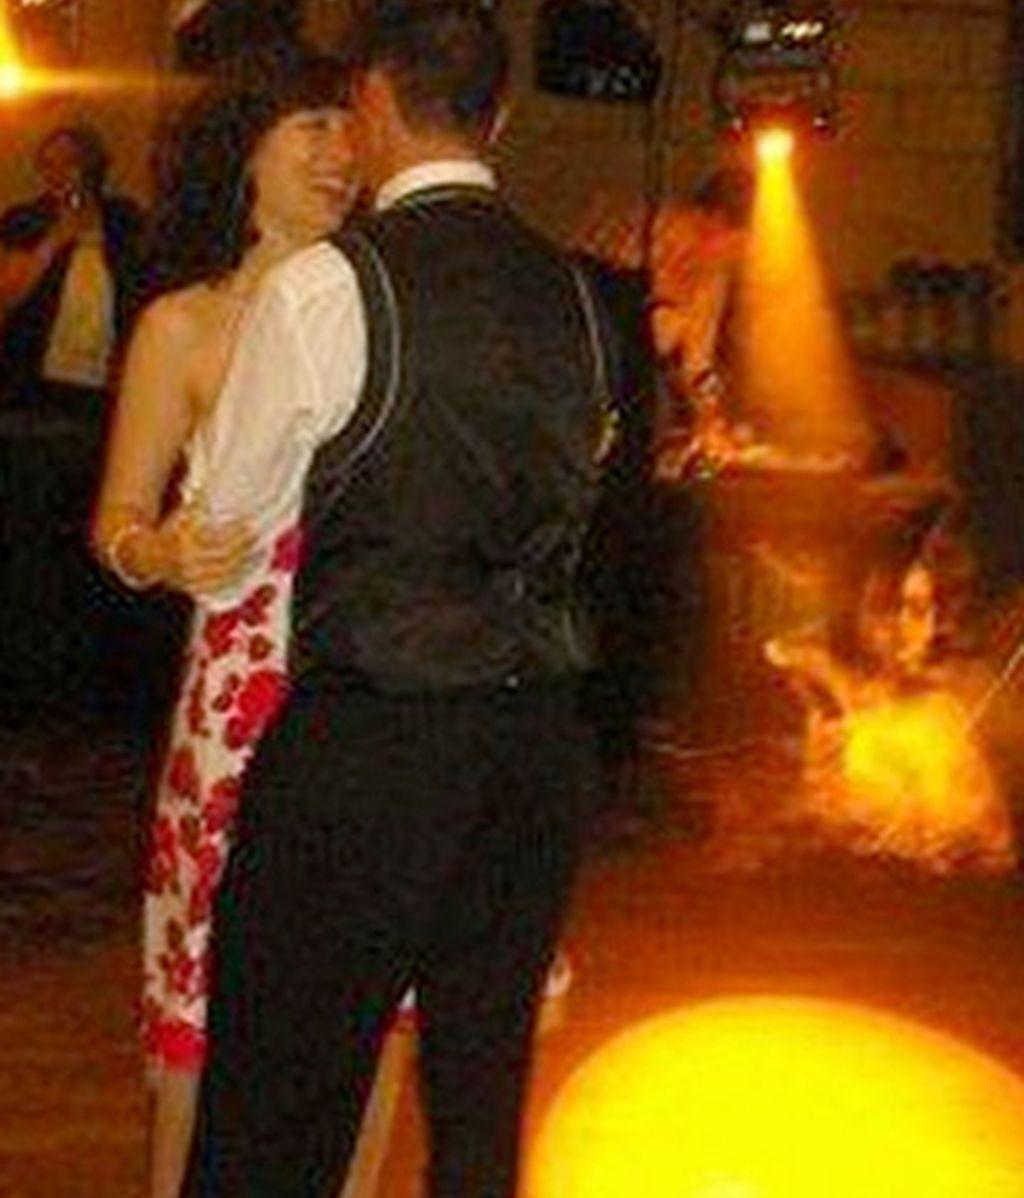 Una misteriosa invitada en la boda